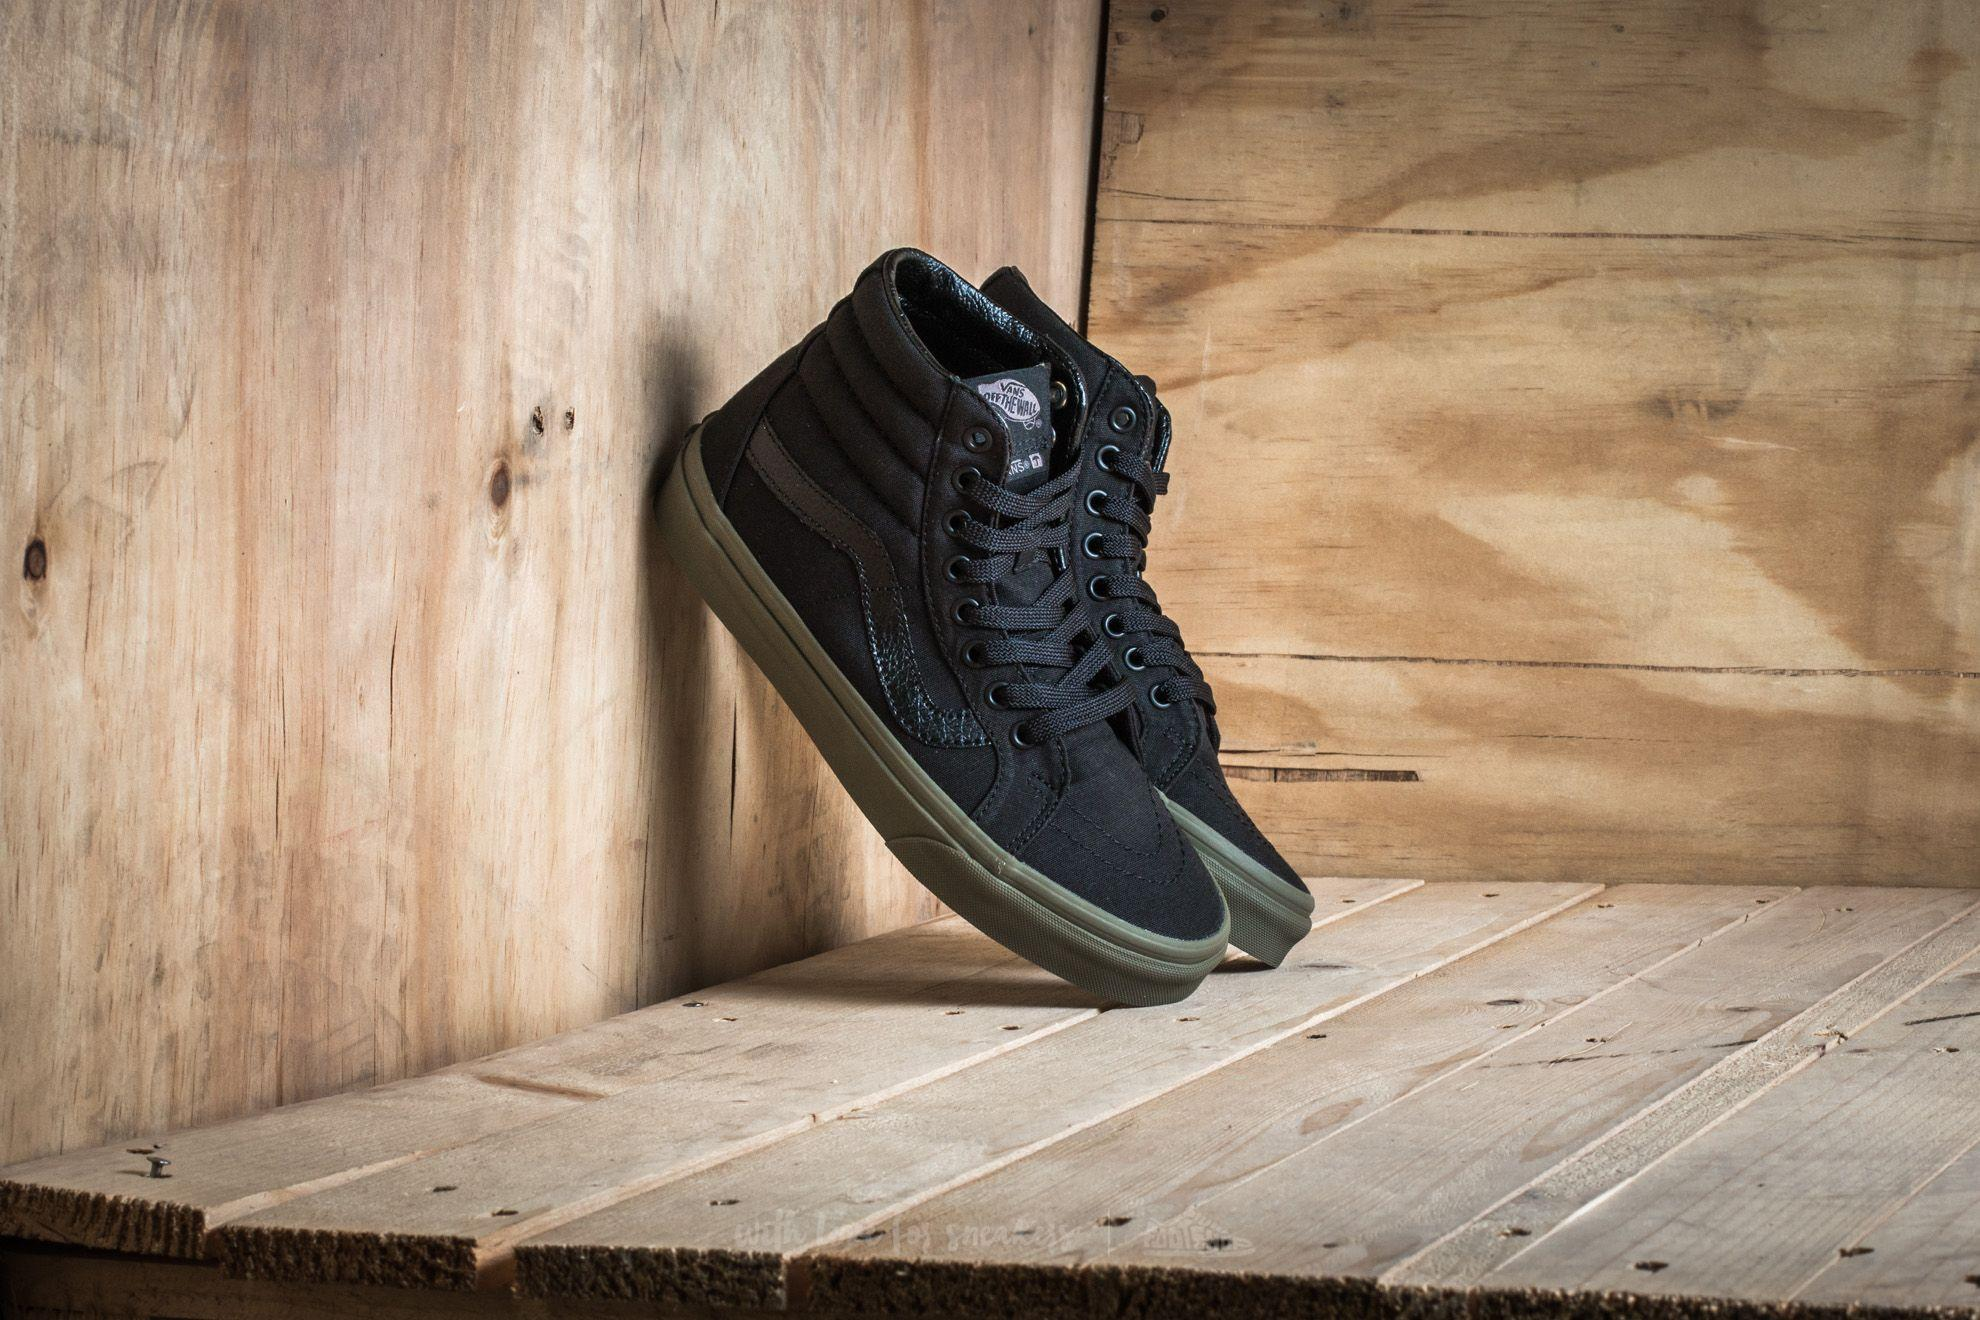 f1642cb0dae15b Lyst - Vans Sk8-hi Reissue Guard Black  Ivy Green in Black for Men